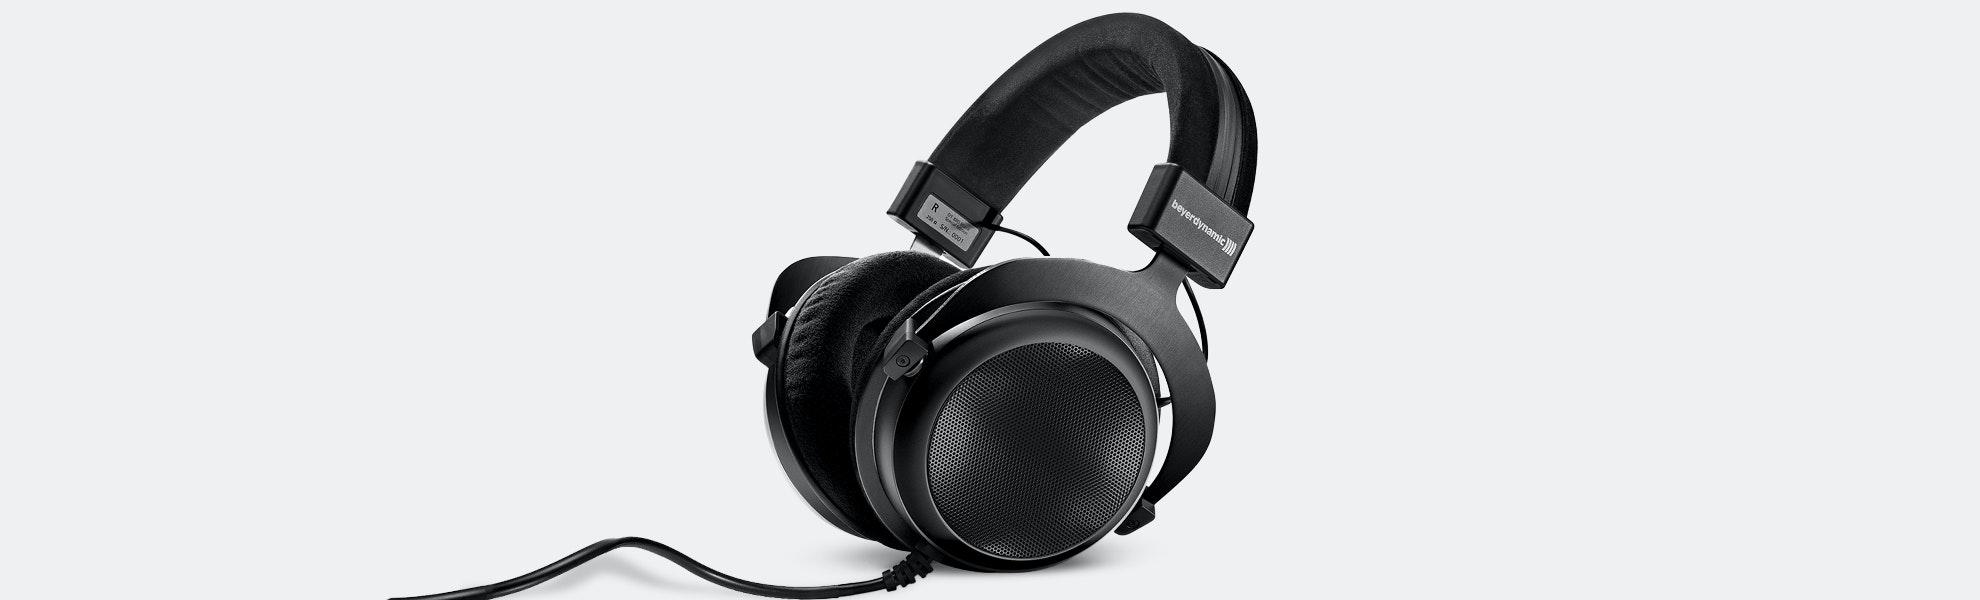 Beyerdynamic DT880 Premium Limited-Edition Black